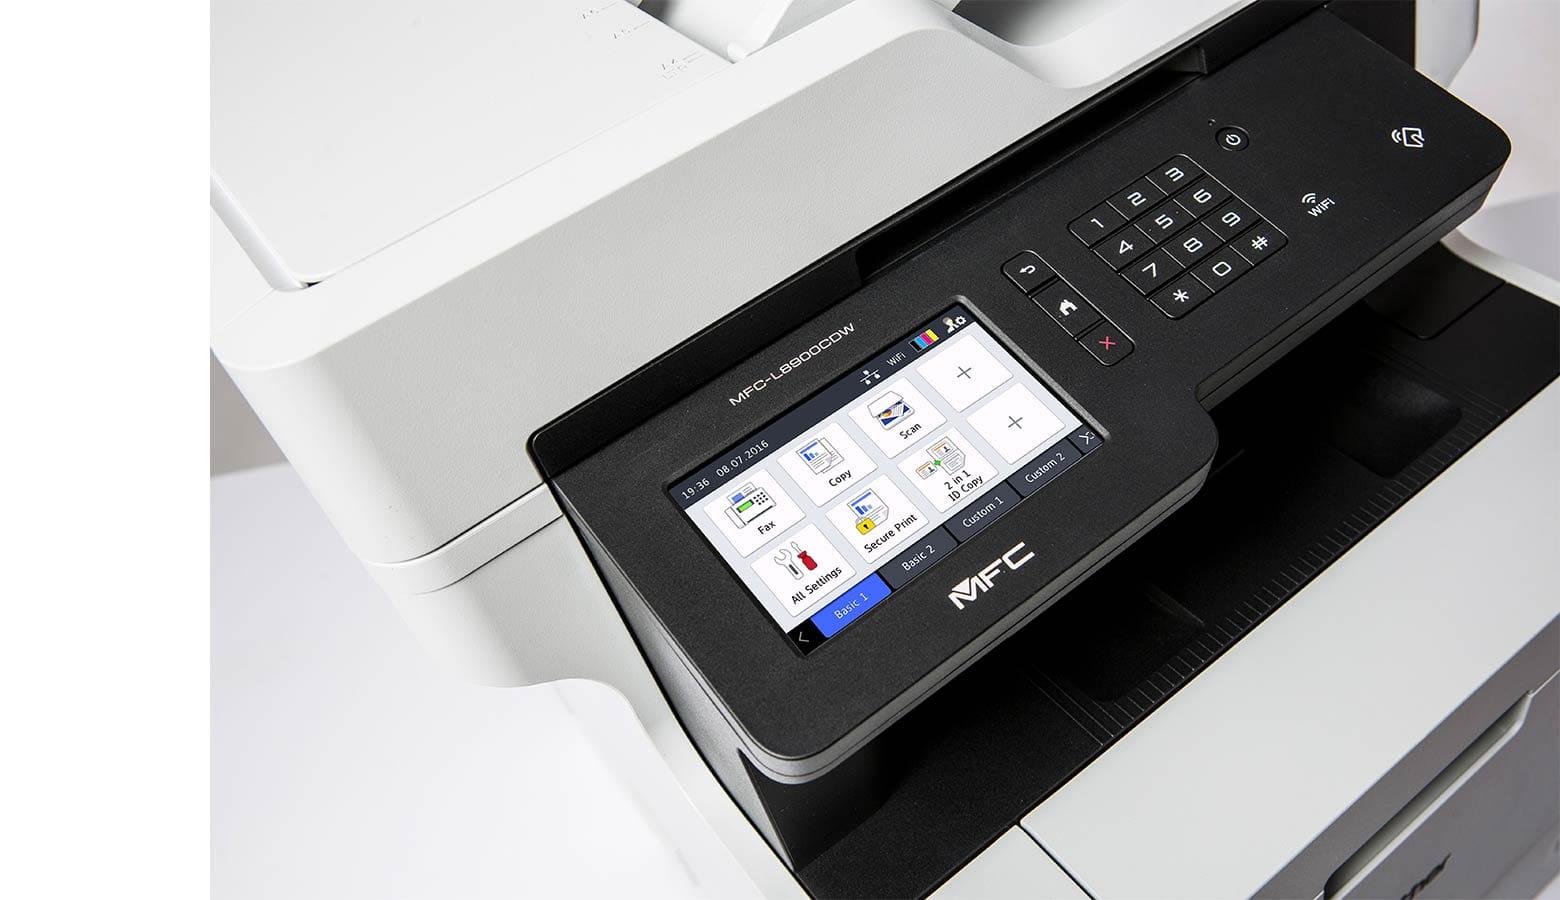 Stampante Beother MFC-L8900CDW dettaglio display soluzioni integrate